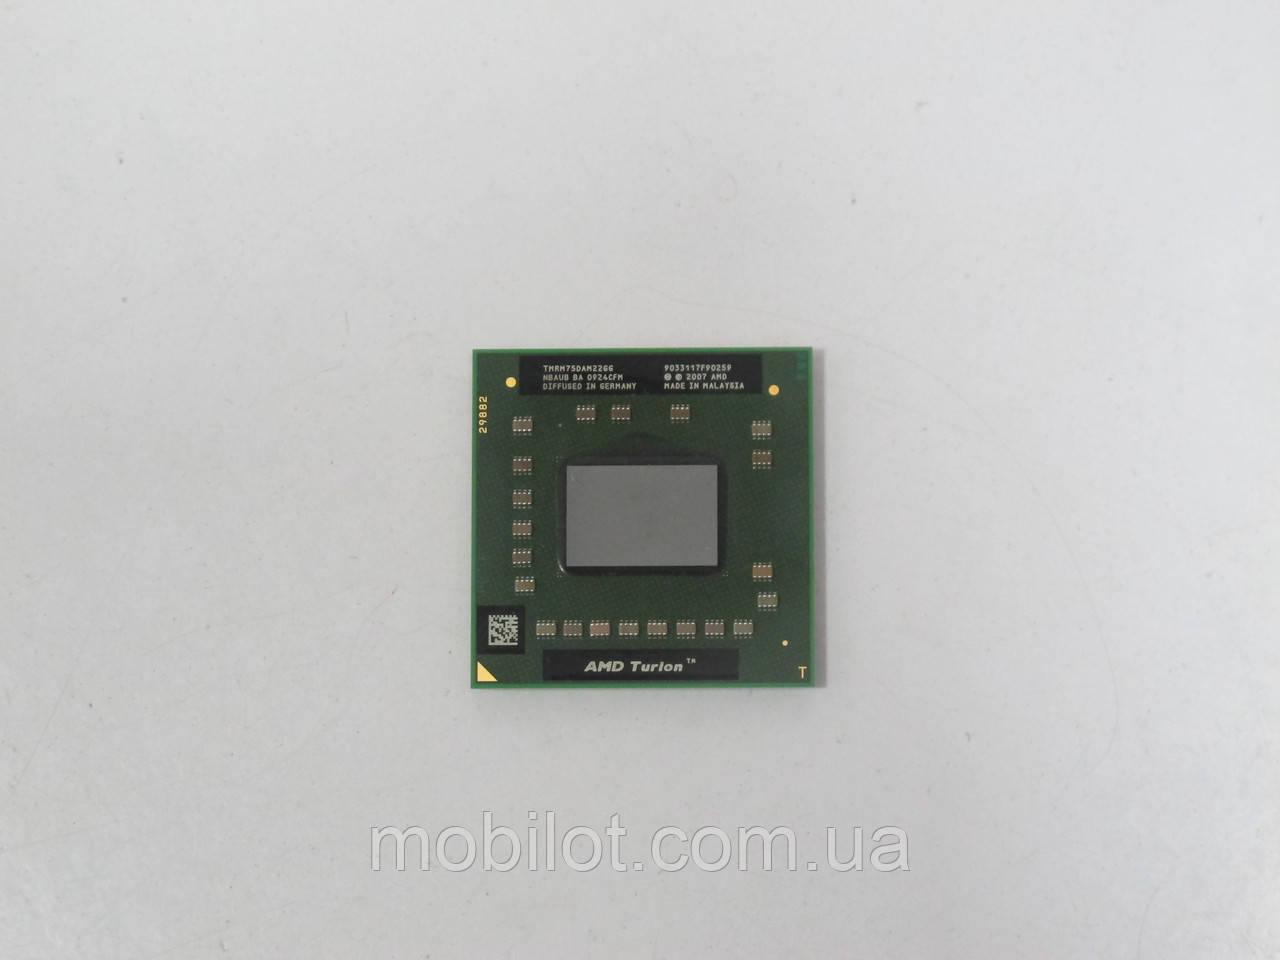 Процессор AMD Turion 64 X2 RM-75 (NZ-6869)